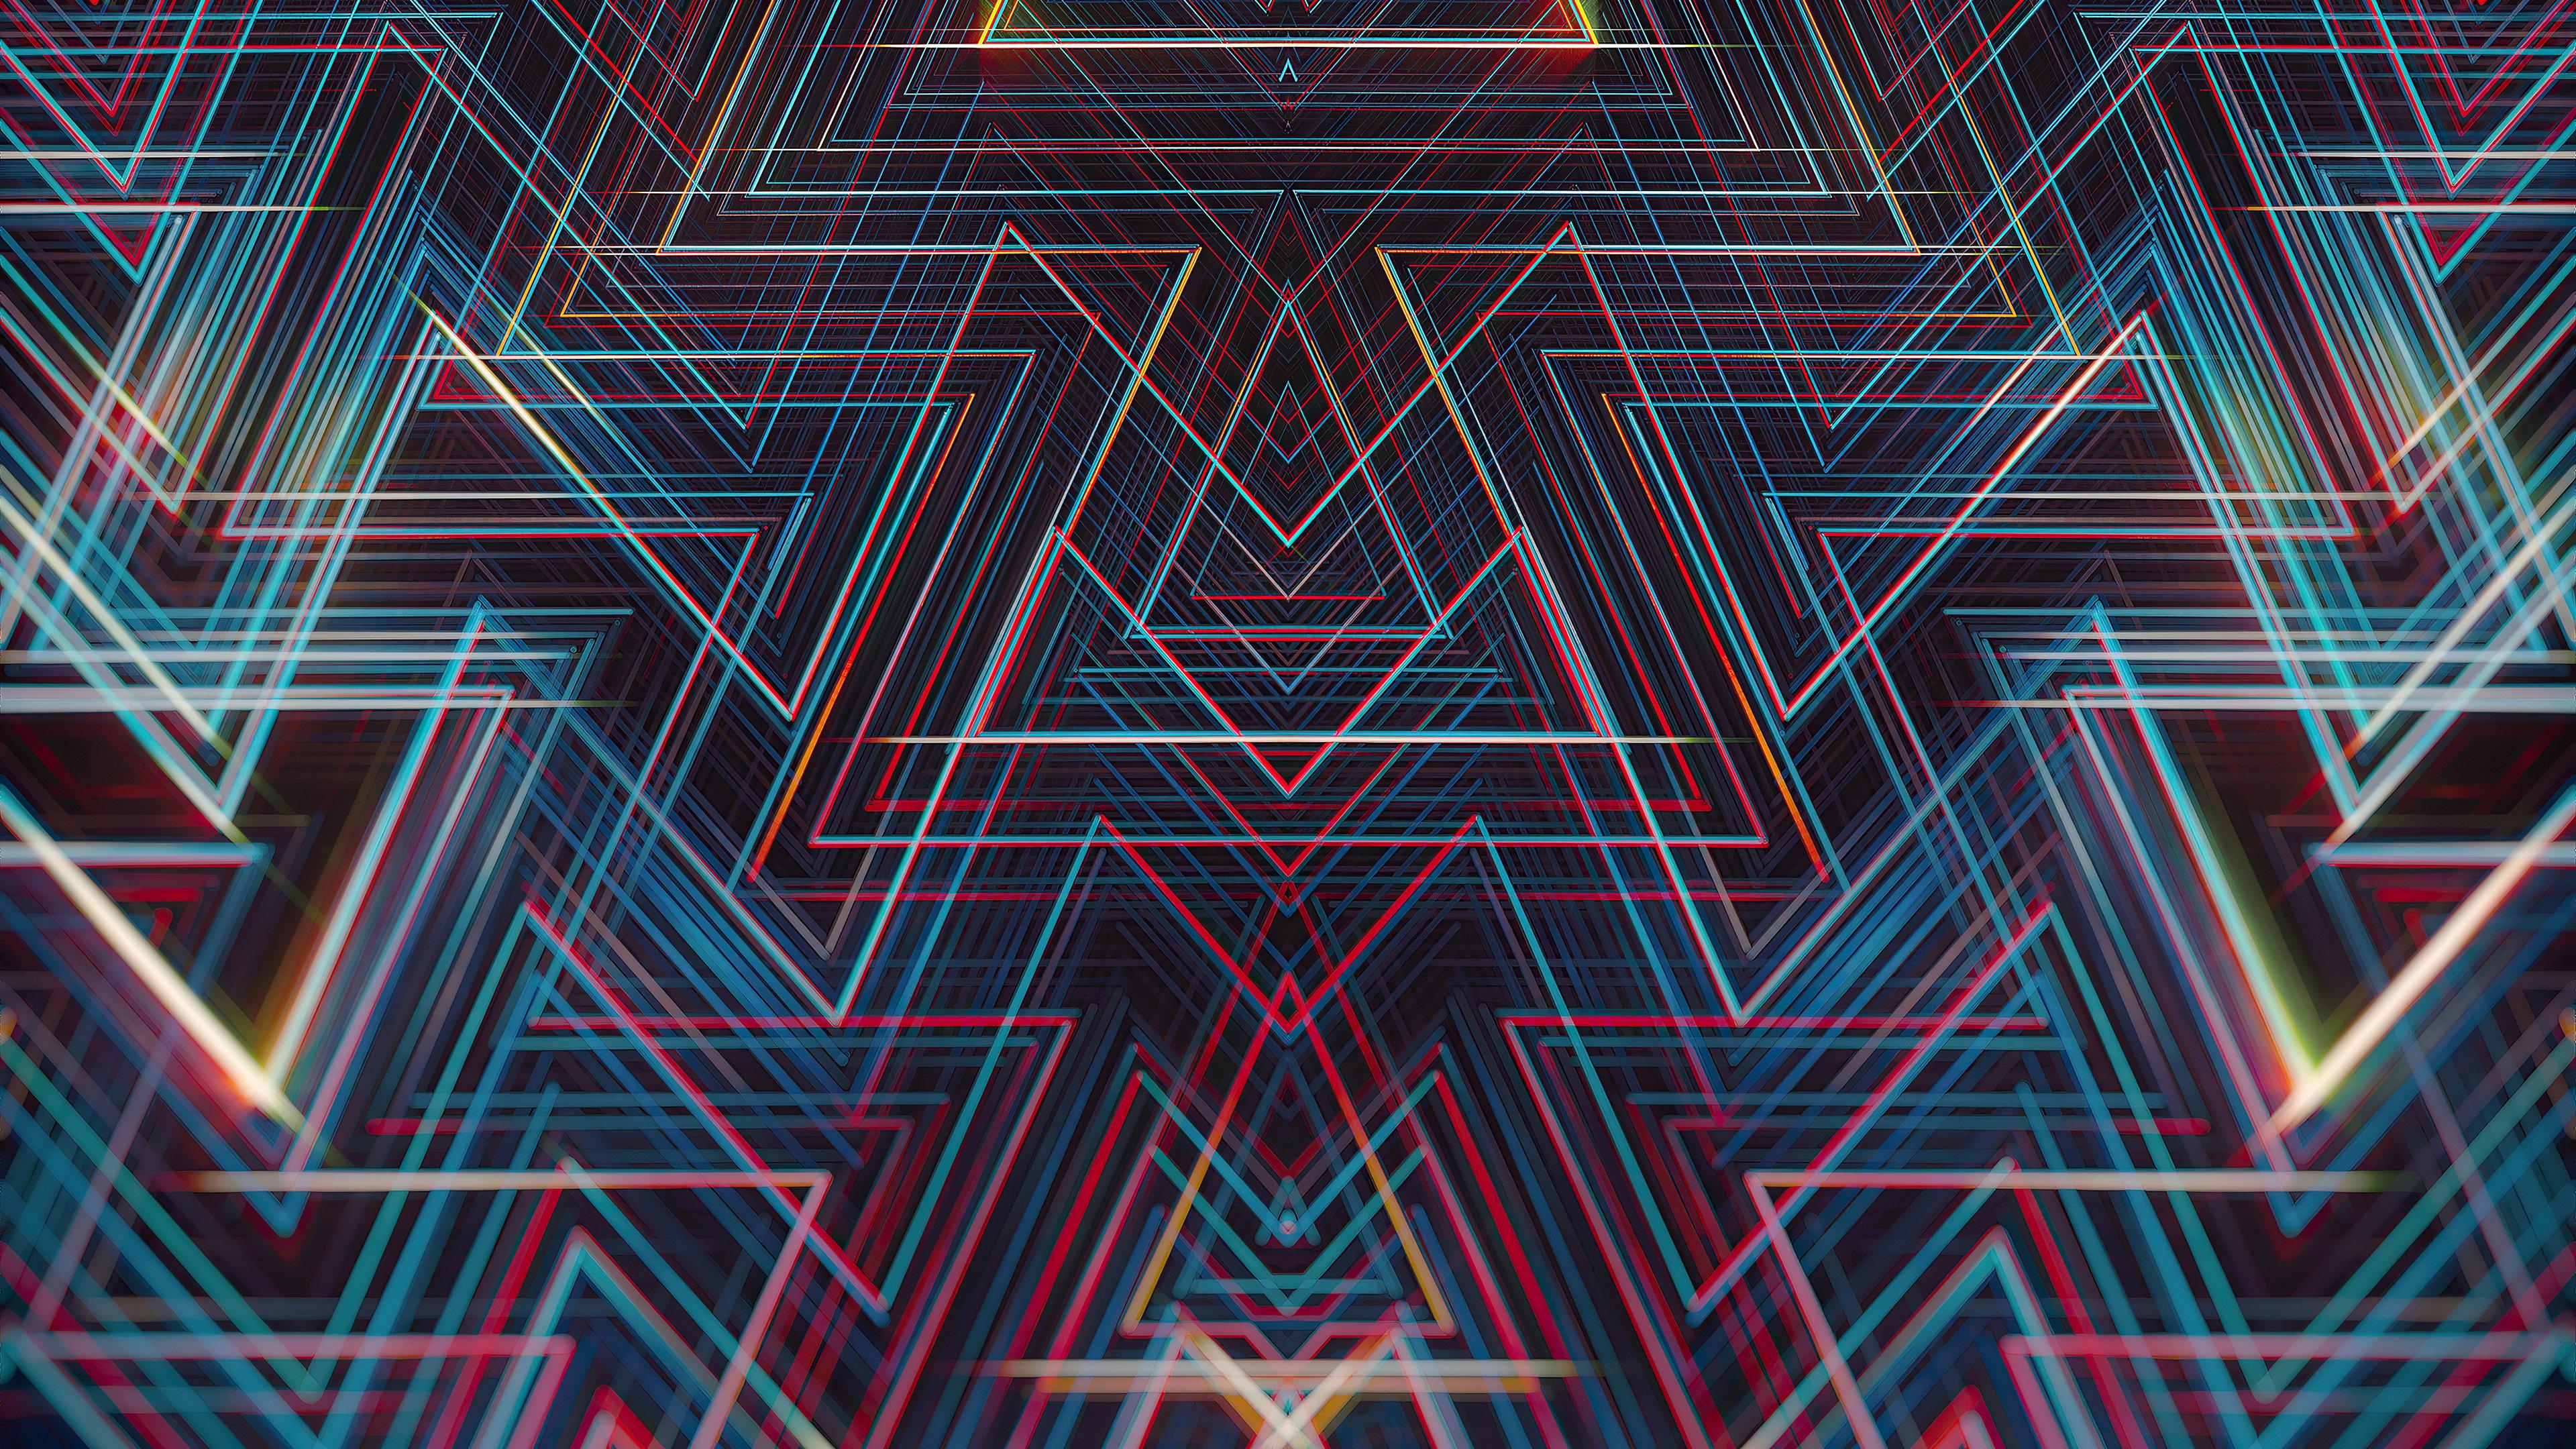 Wallpaper Lines Symmetry